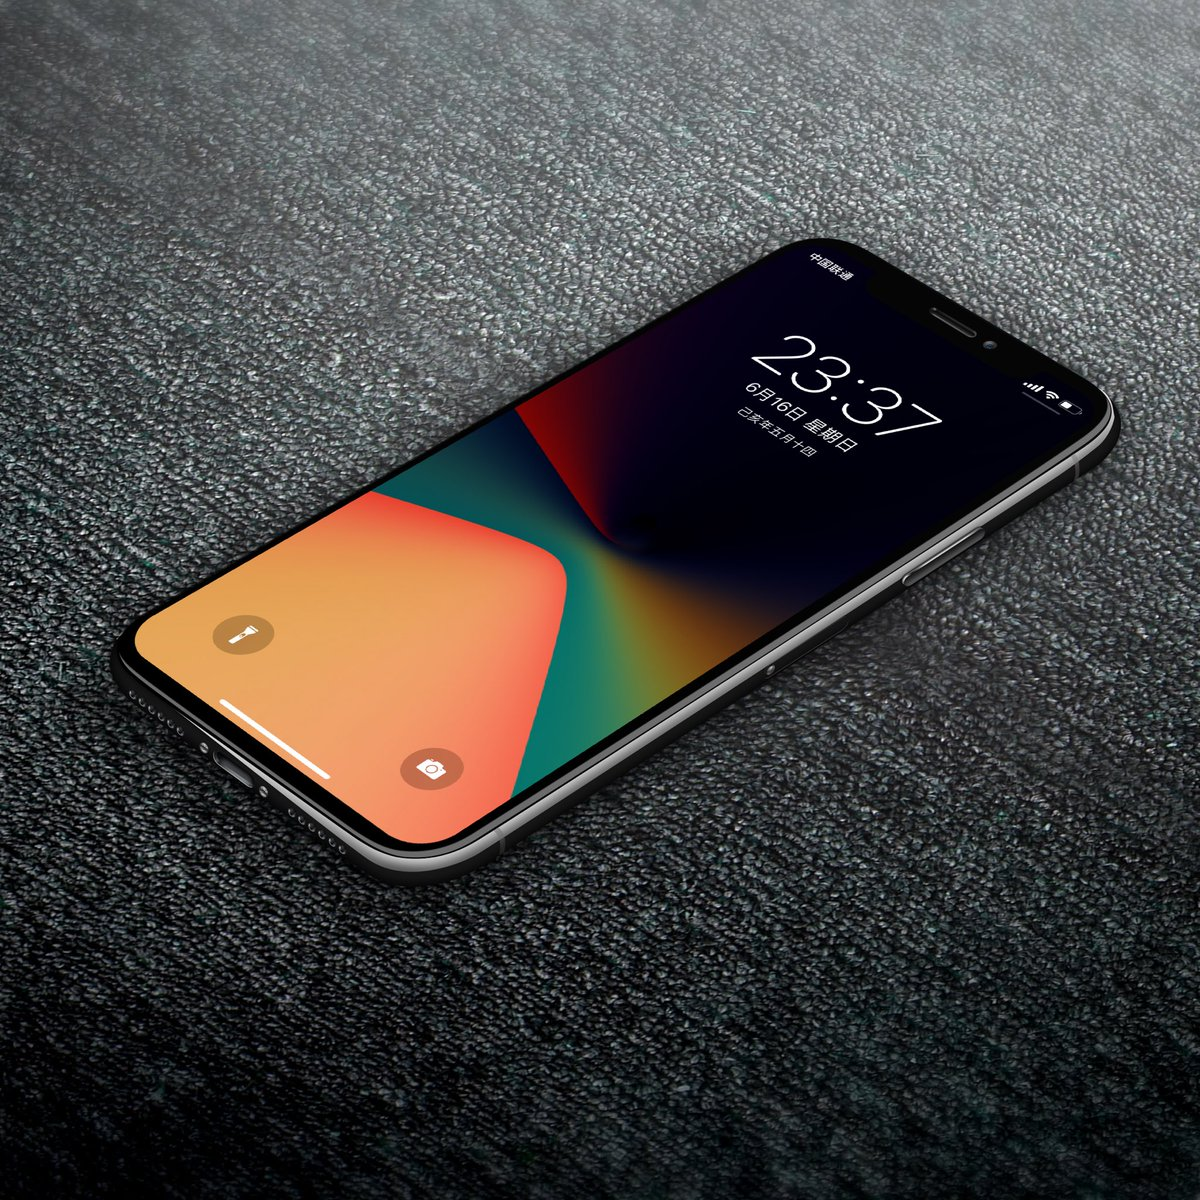 #wallpapers #homescreen #lockscreen   🚦#wallpaper  🚦#iPhoneXSMAX   🚦#iPhoneXR  🚦 #iPhoneXS   🚦#iPhoneX  #iPhone   🚦#walls  #android #pixel  🚥@ongliong11 🚥  wallpaper🔗:https://drive.google.com/open?id=1NNUbkIuv0Zu2kcQOoX_U9qgfB3BhUc5l…